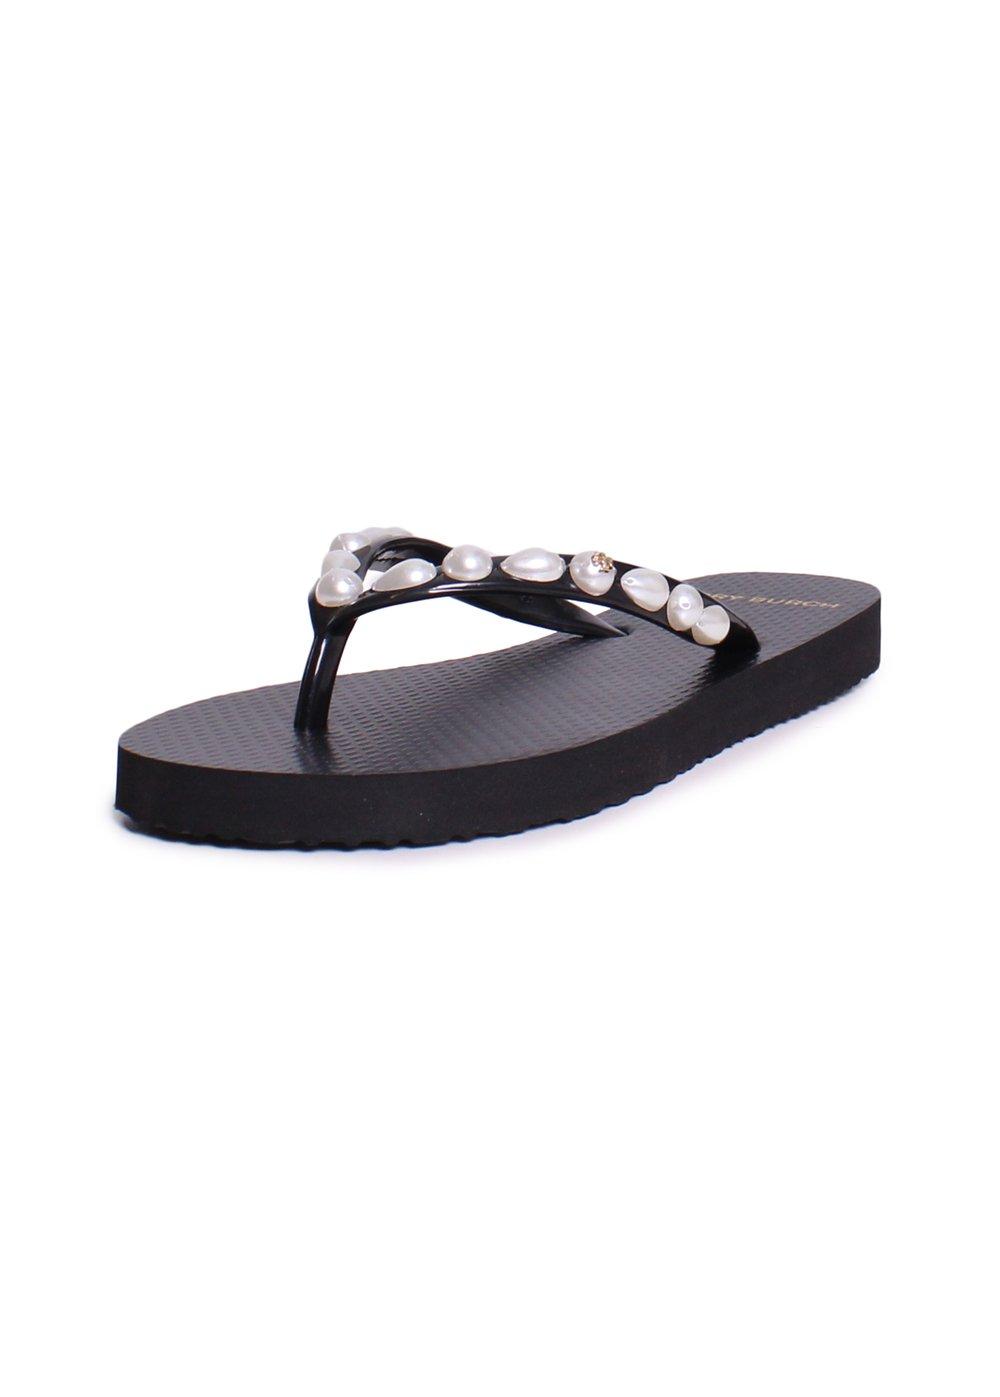 Tory Burch Flip Flops Shoes Sandals Flat Rubber (9, Pearl Black)